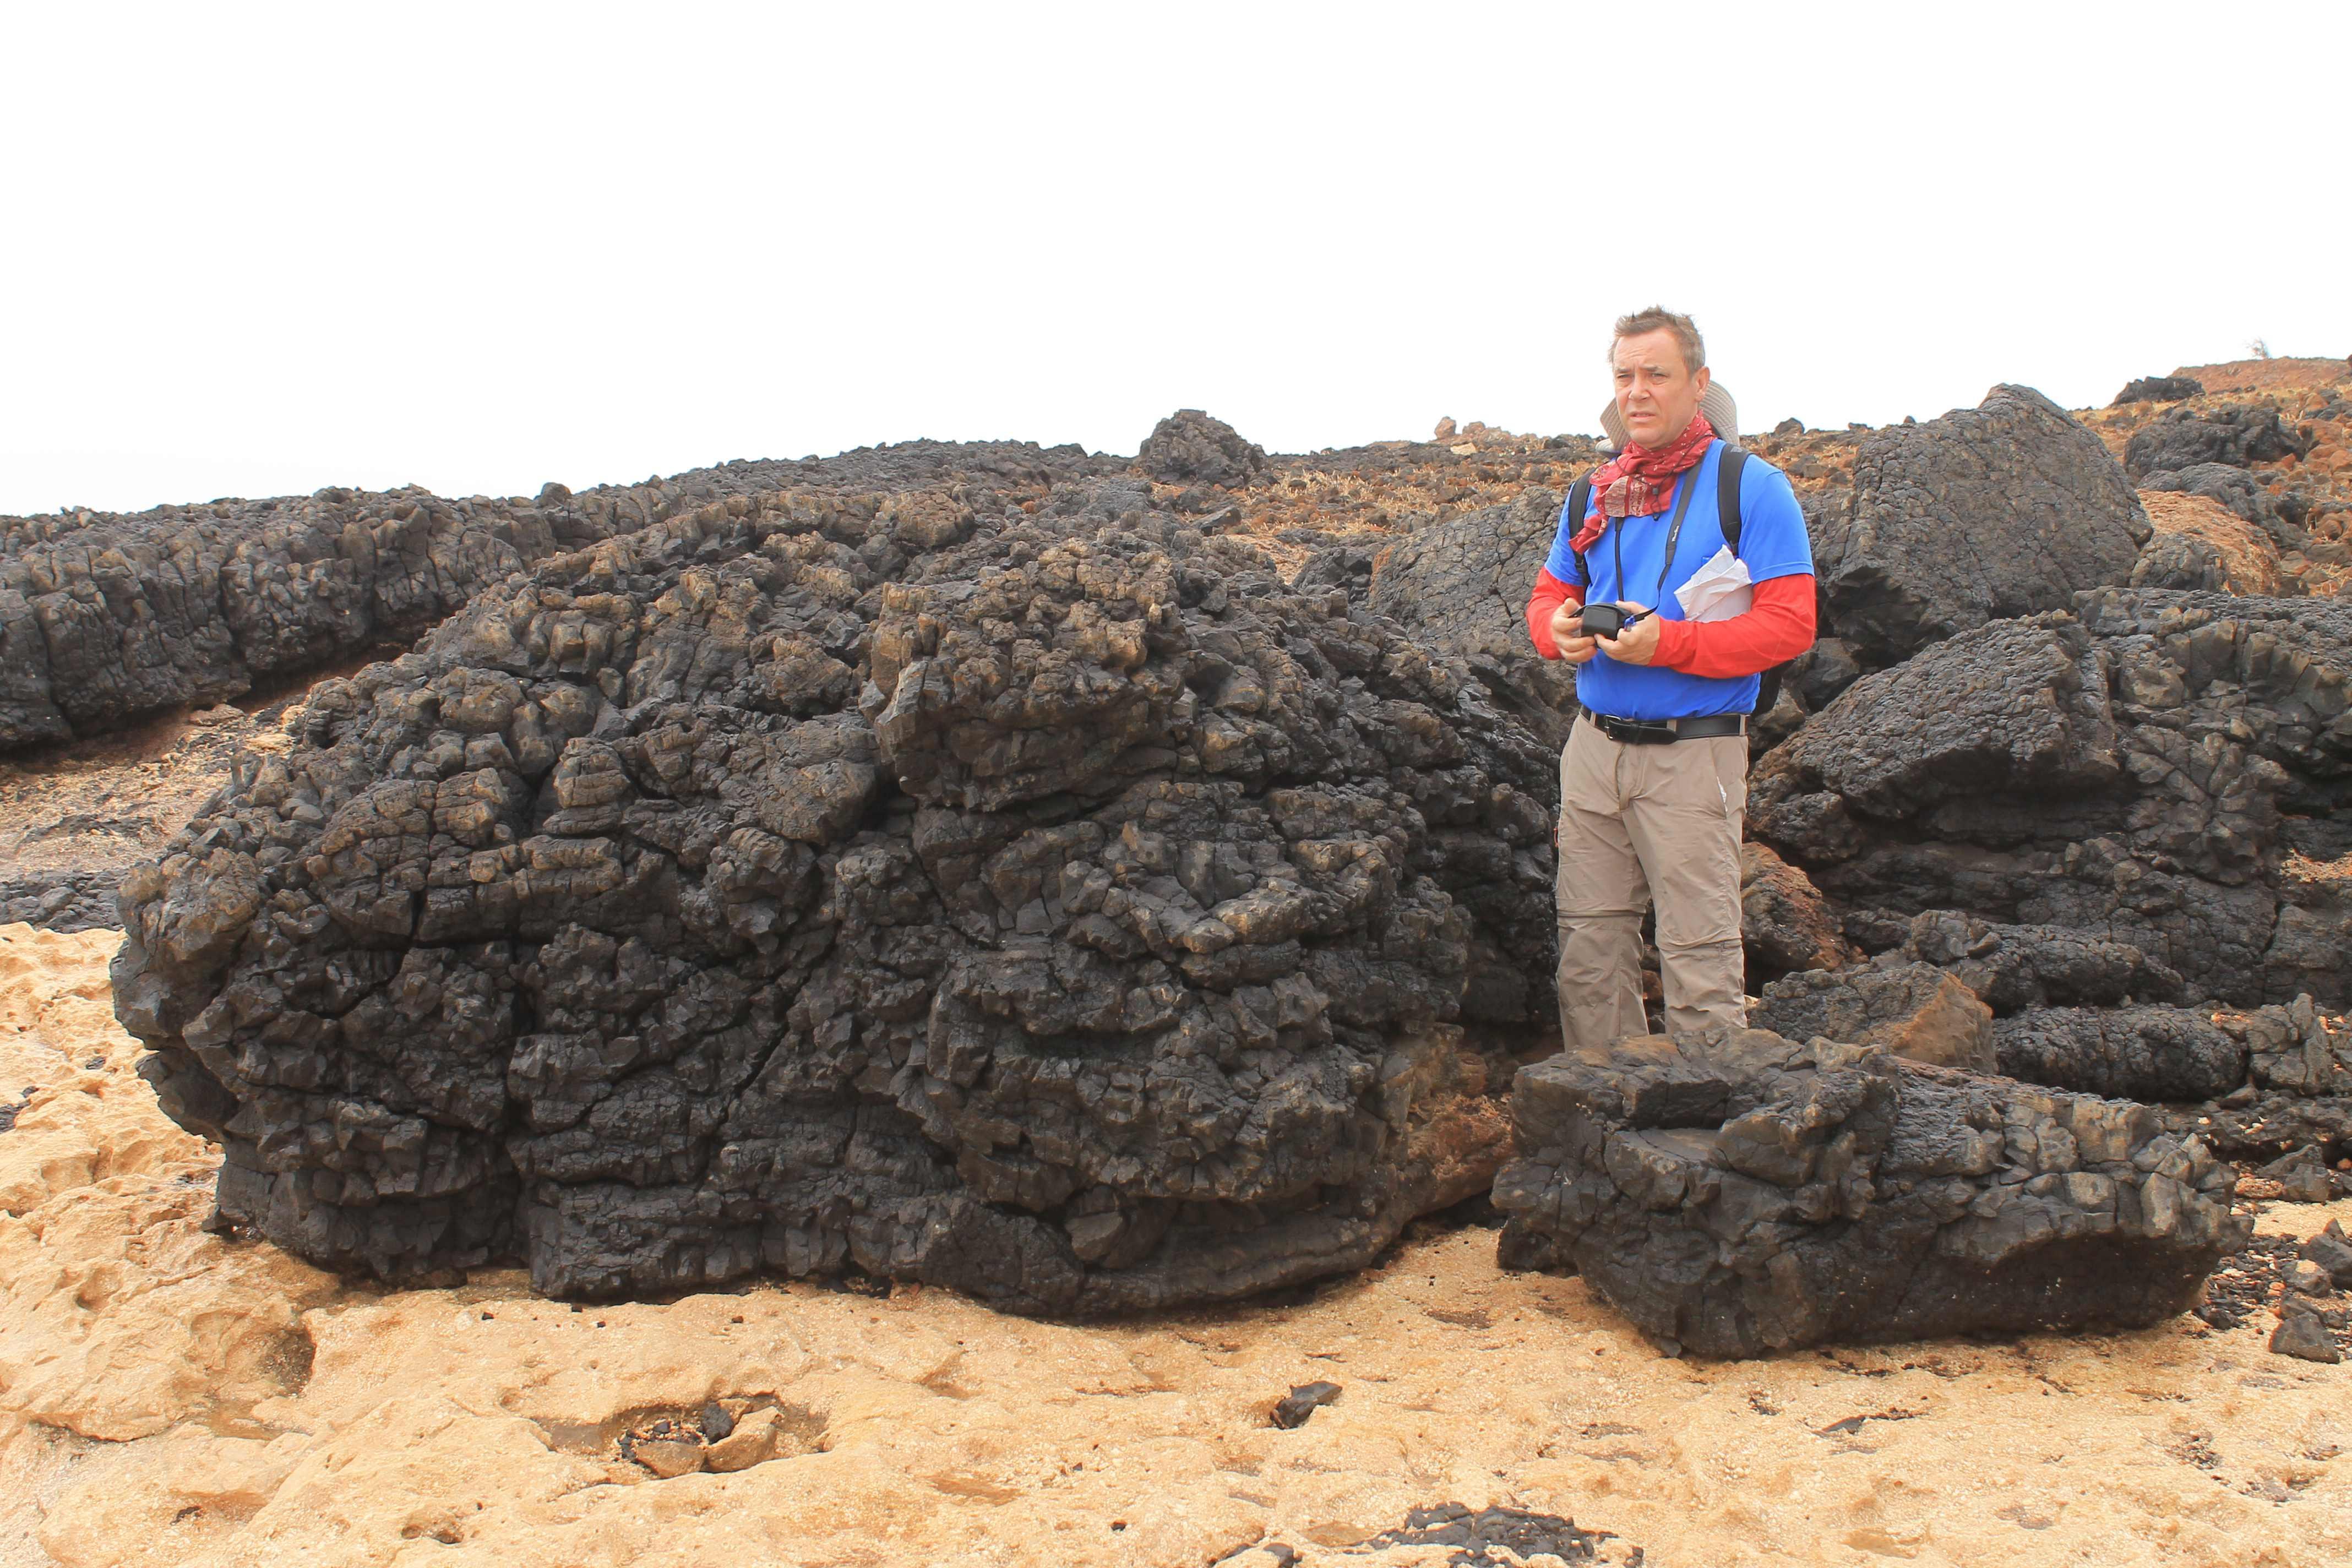 Pilow-basalt-above-marine-scarbonatesuccession_a_2